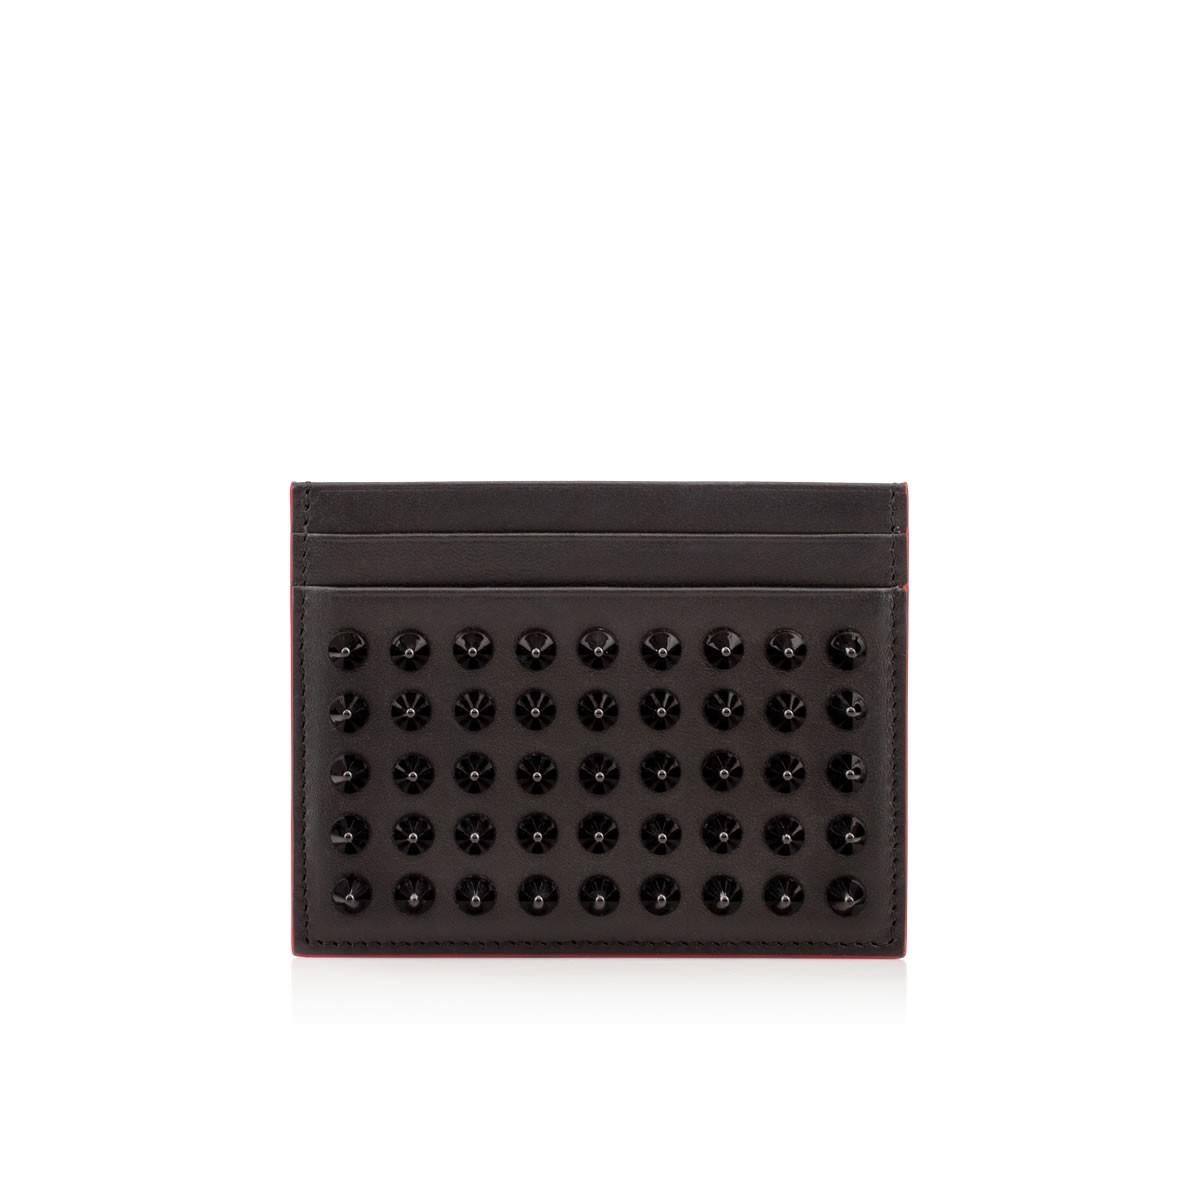 Christian Louboutin Kios Spike-Embellished Leather Cardholder In Black